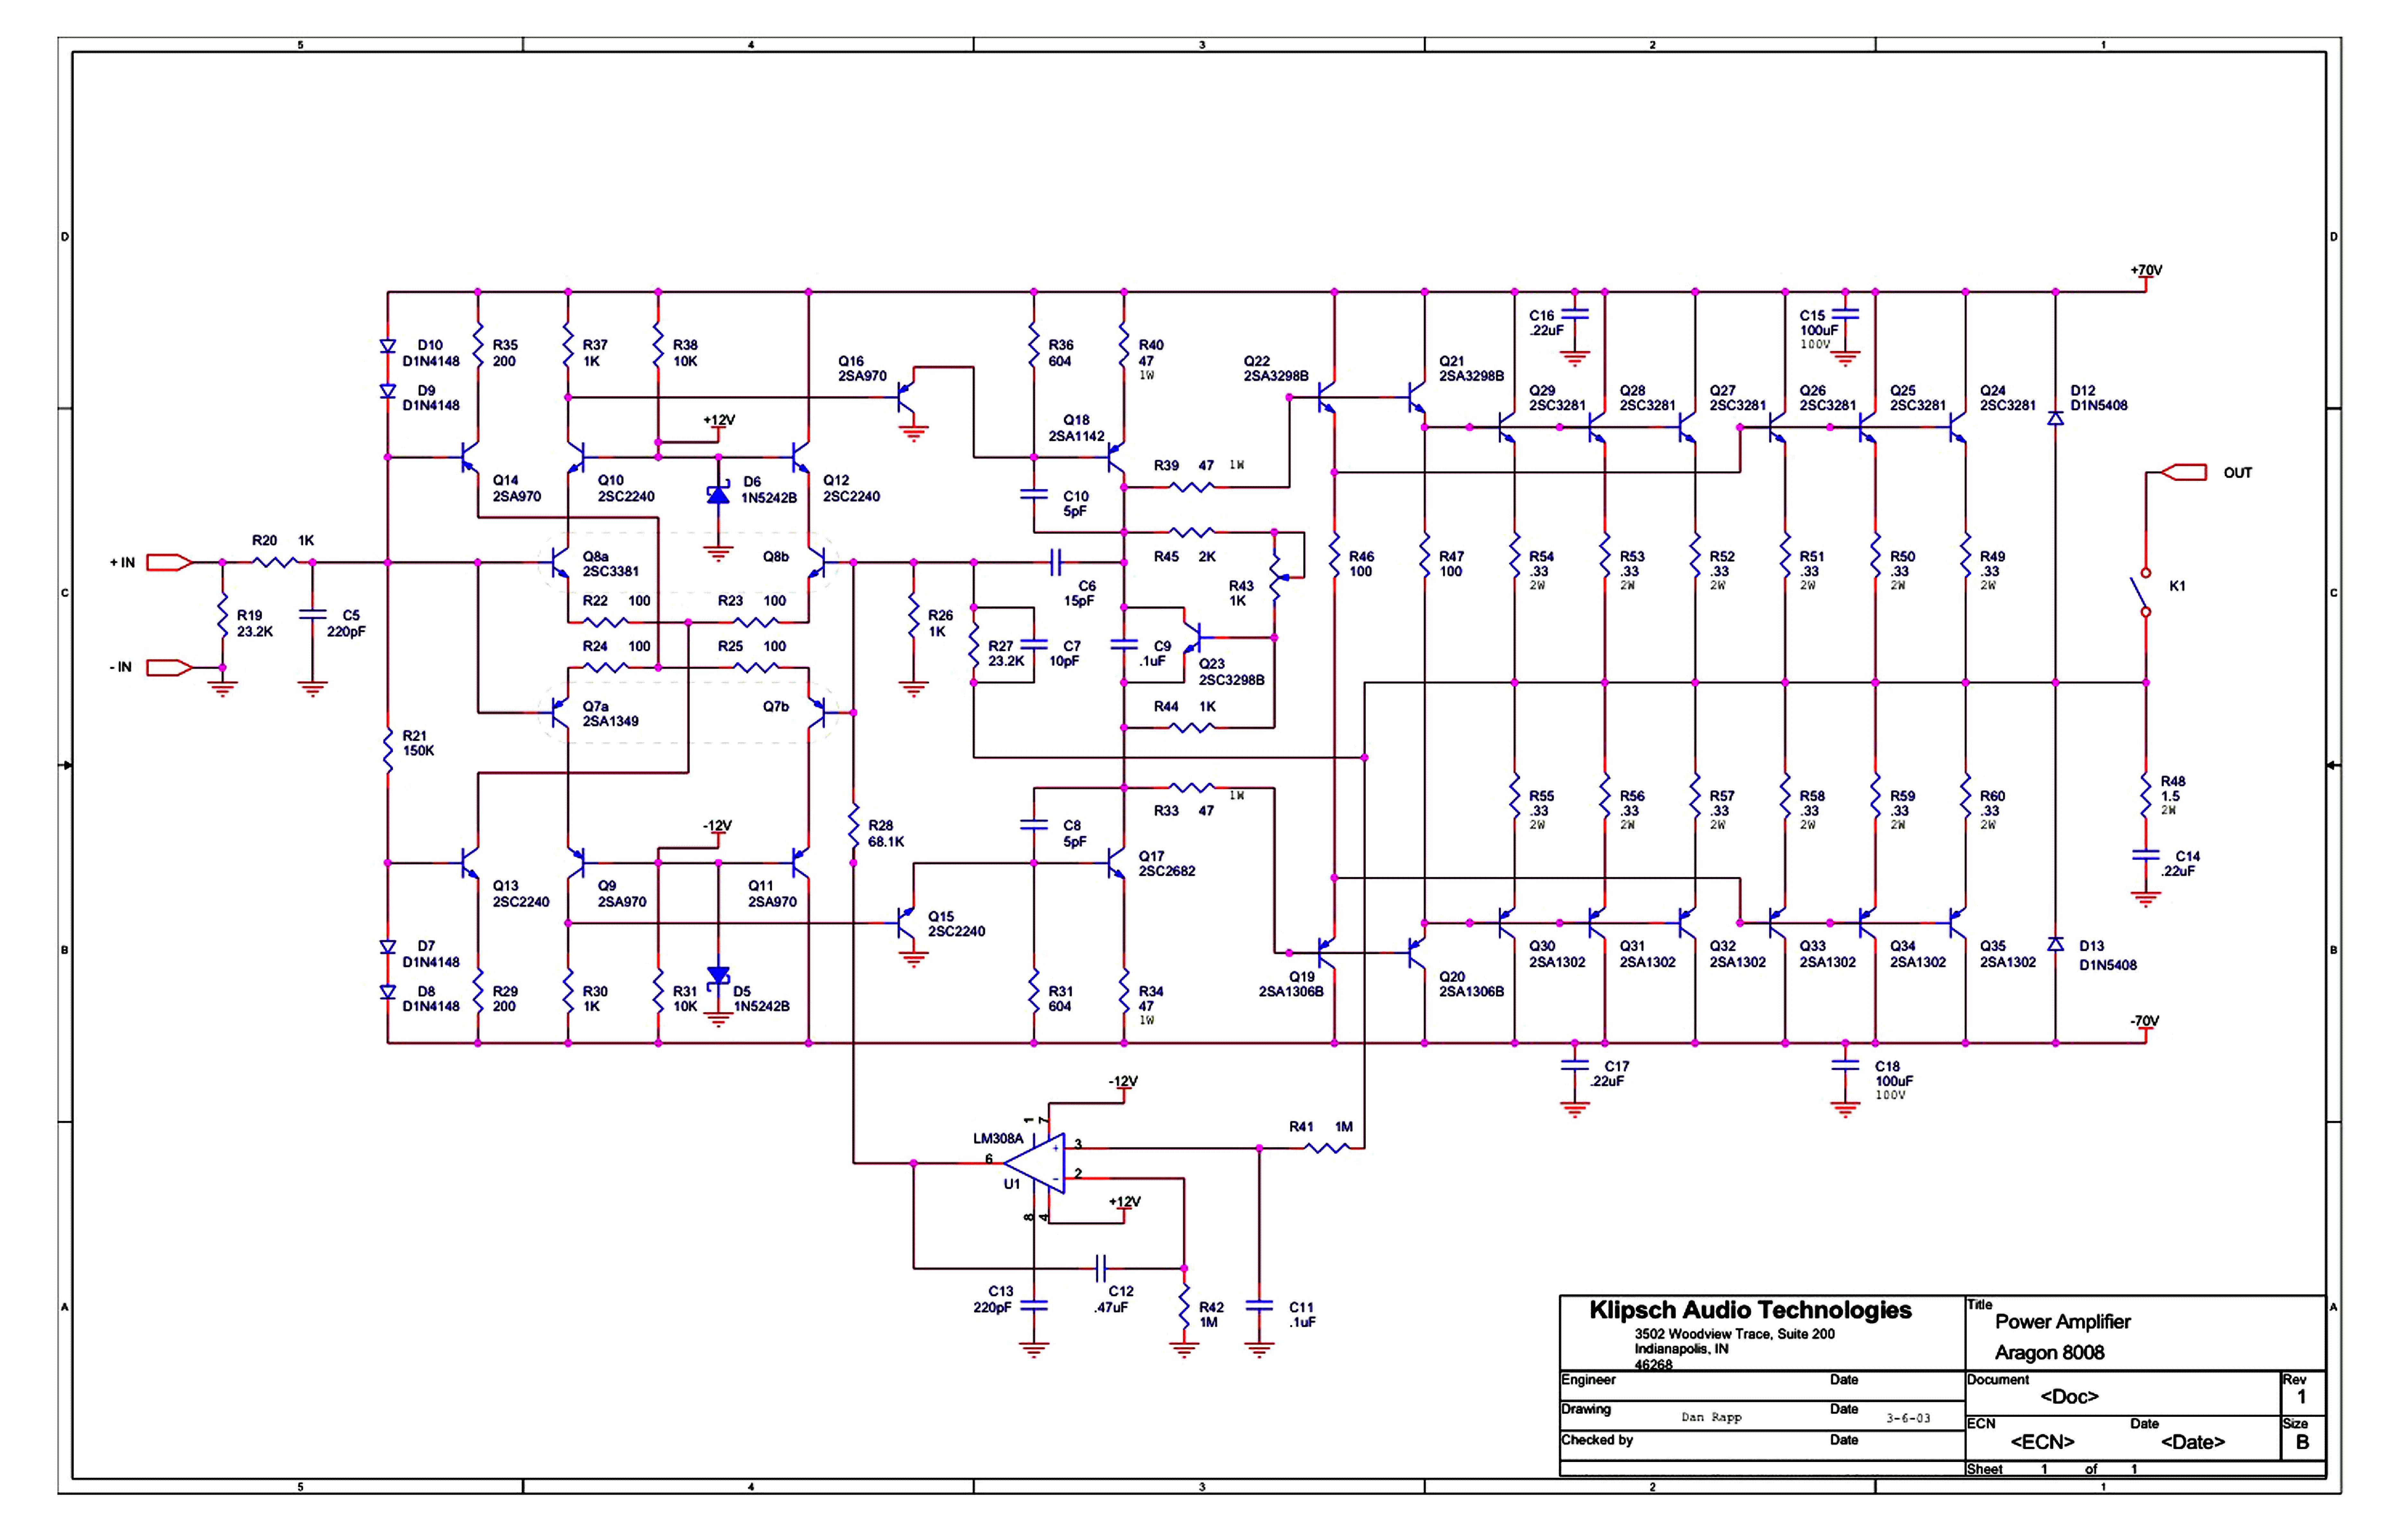 Klips Audio Designs Aragon 8008 Ii Schematic Service Manual Download Klipsch Promedia 2 1 Wiring Diagram 1st Page